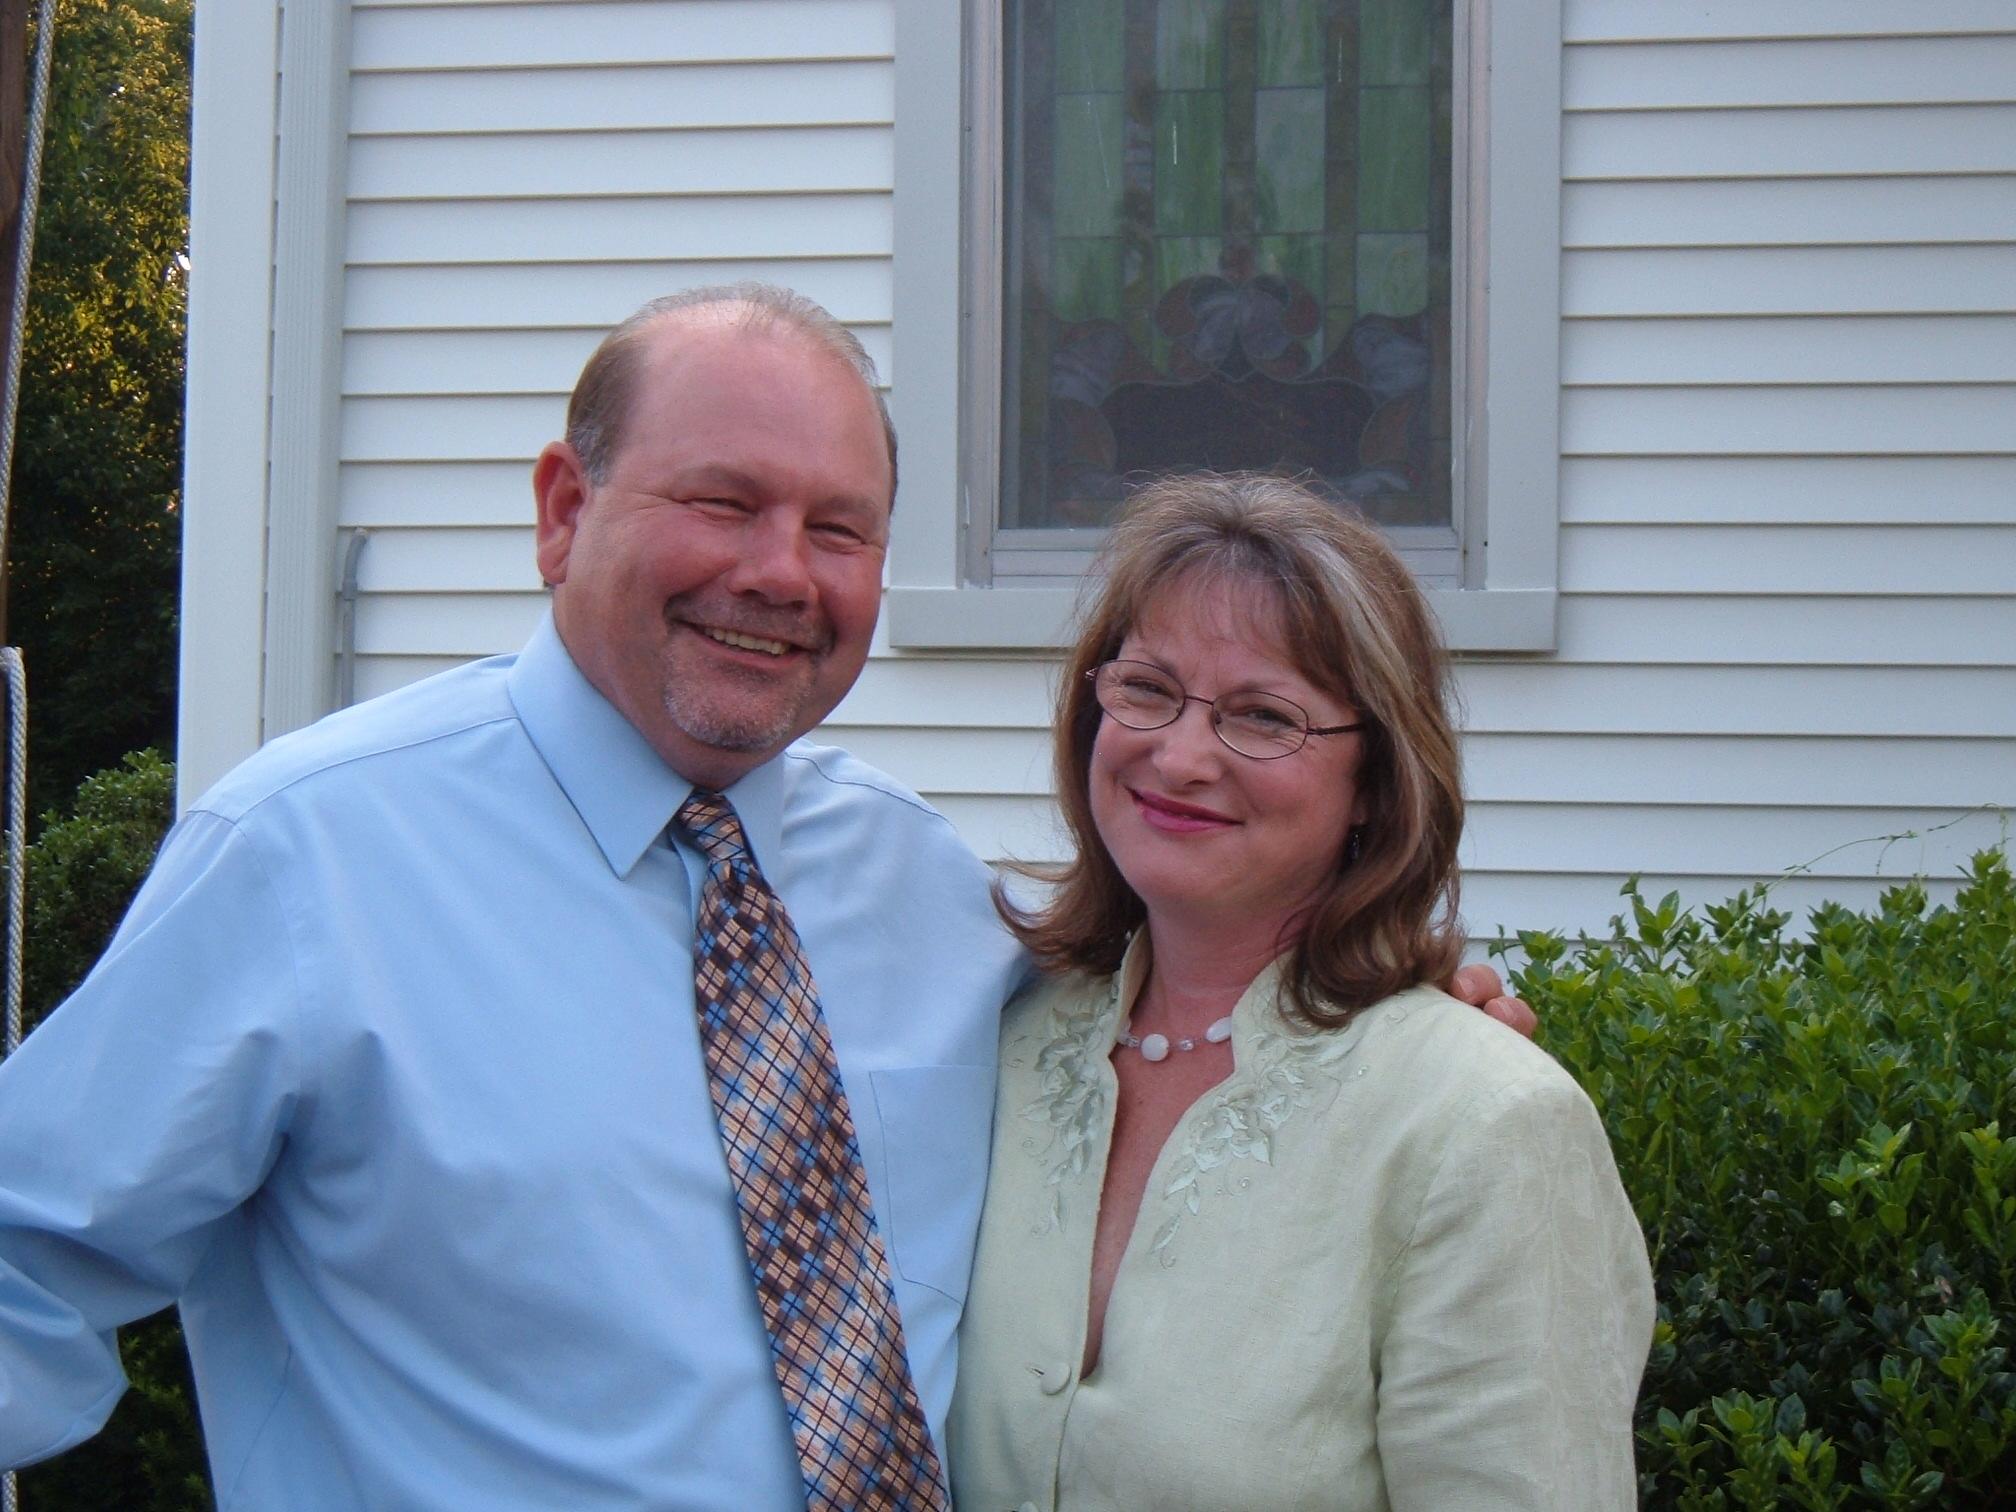 Steve and Melanie Kenney